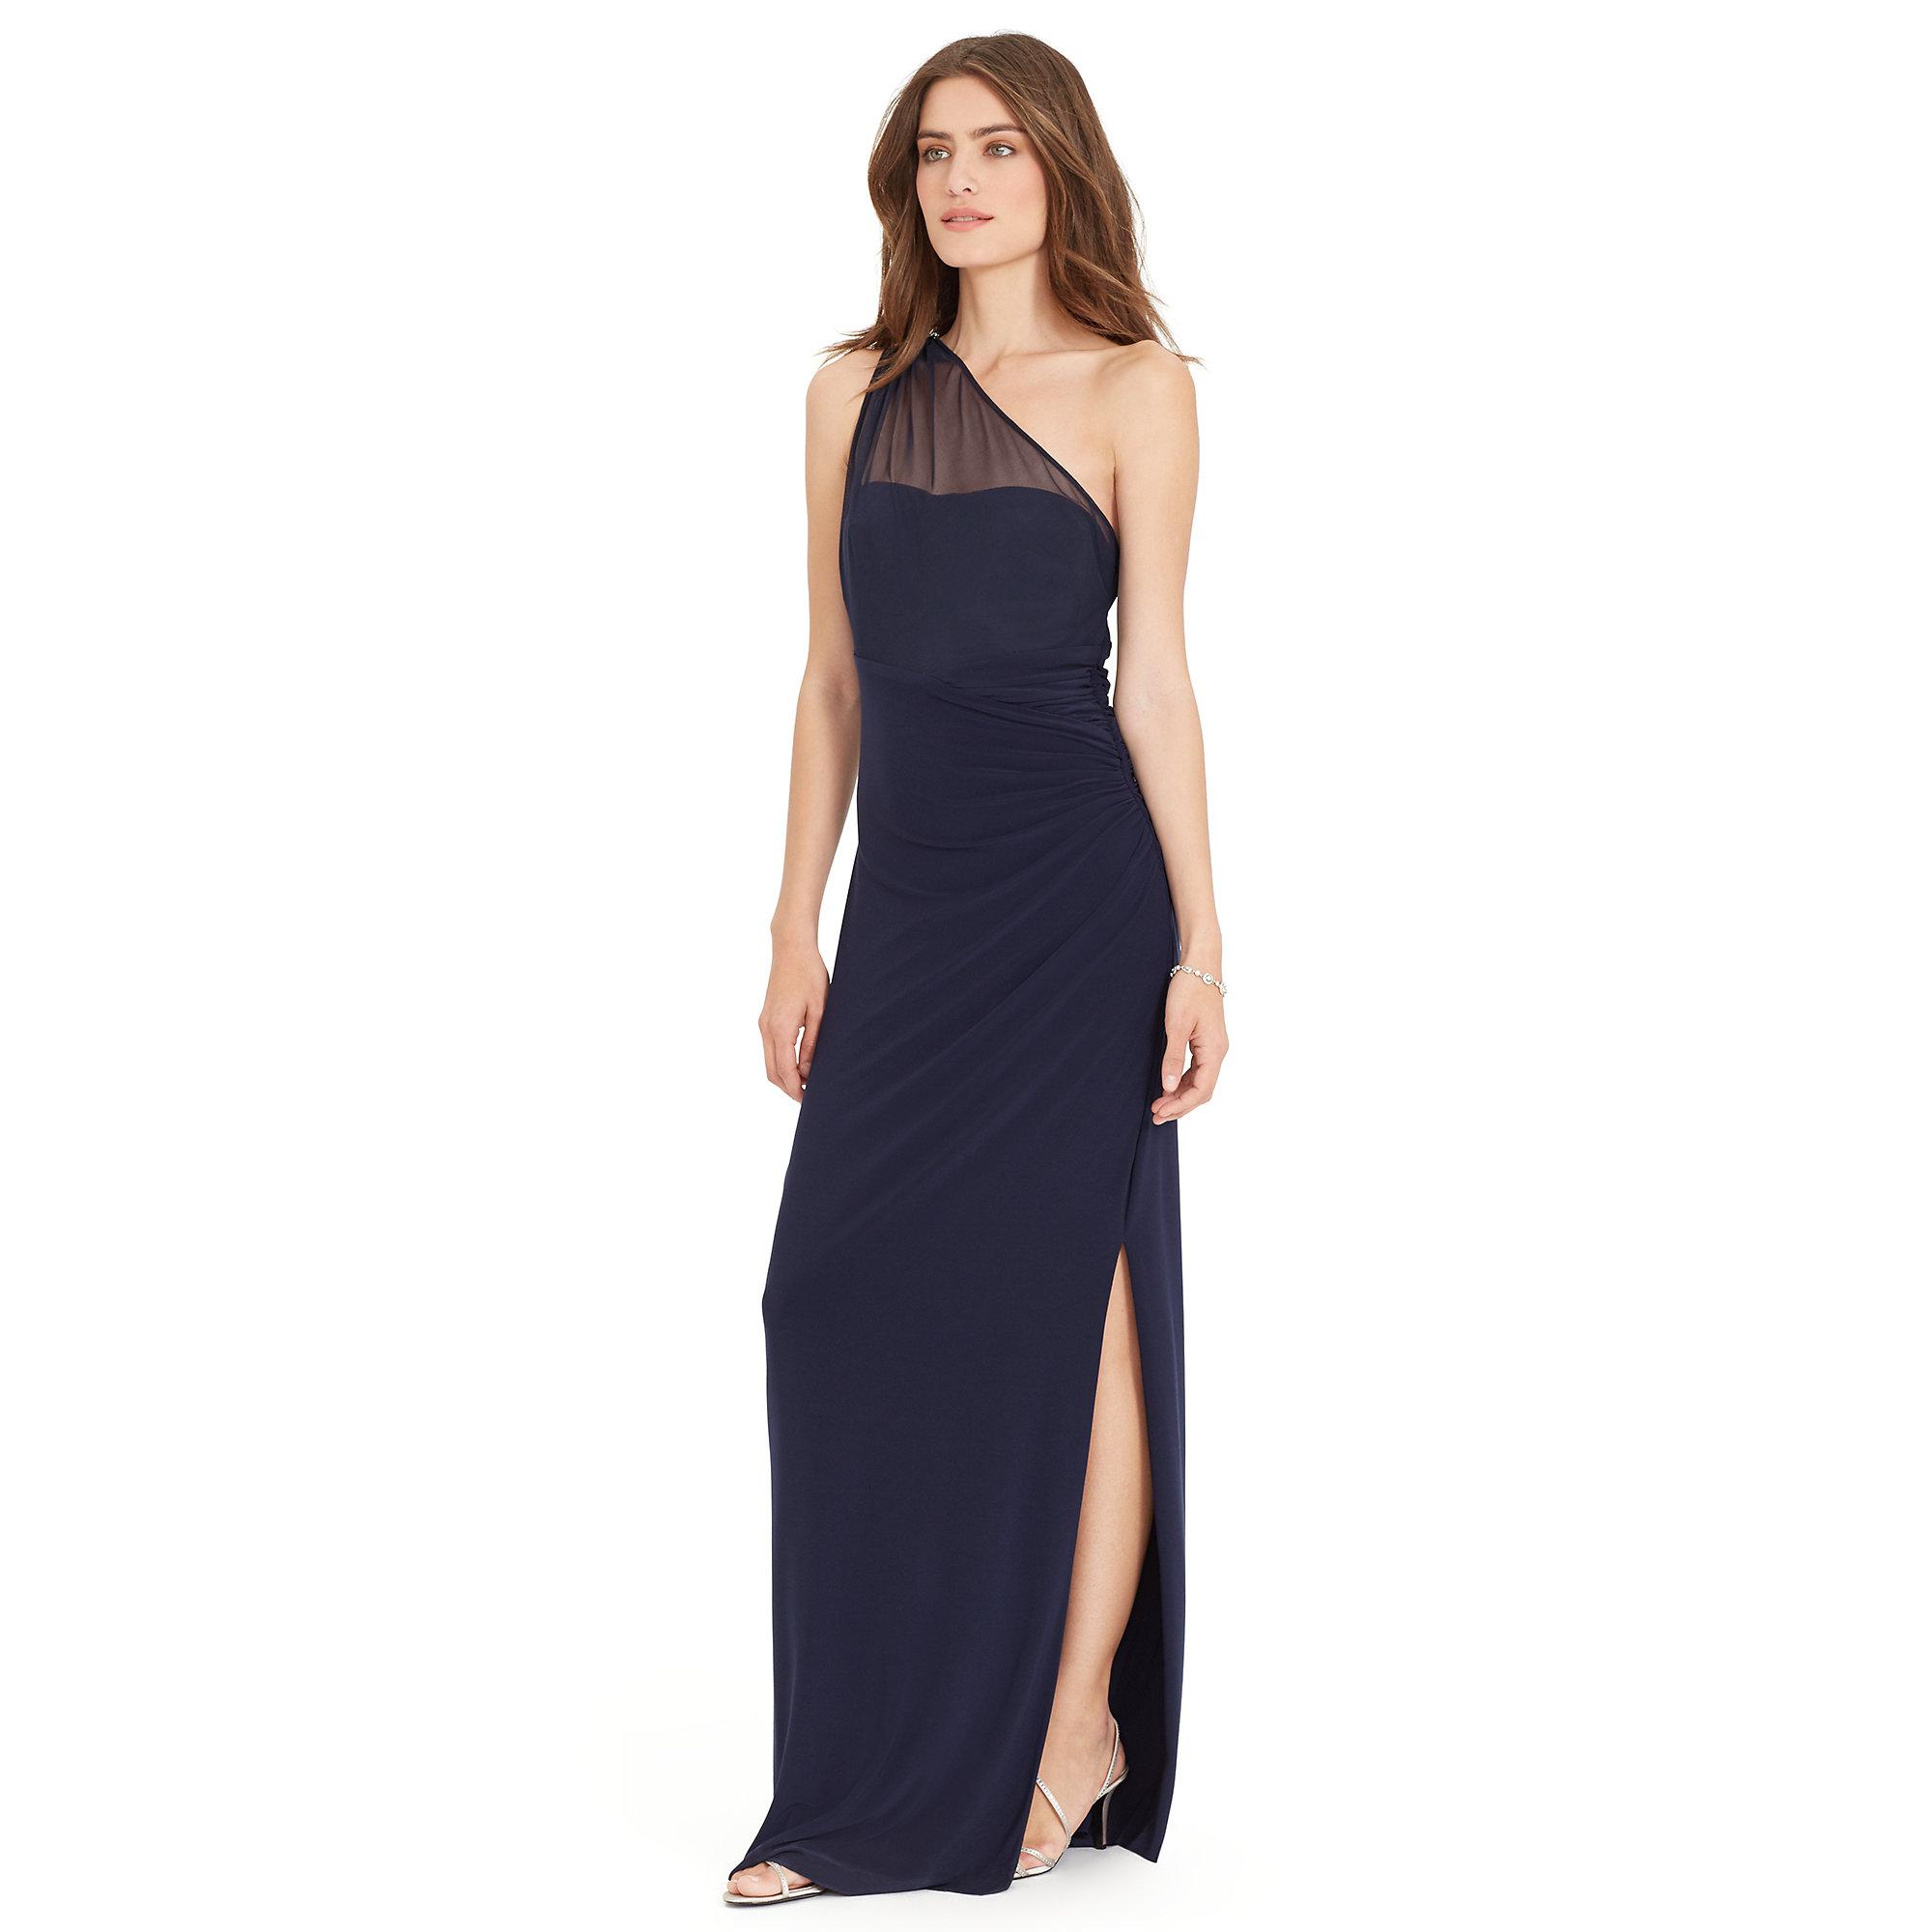 Ralph lauren One-shoulder Jersey Gown in Blue | Lyst